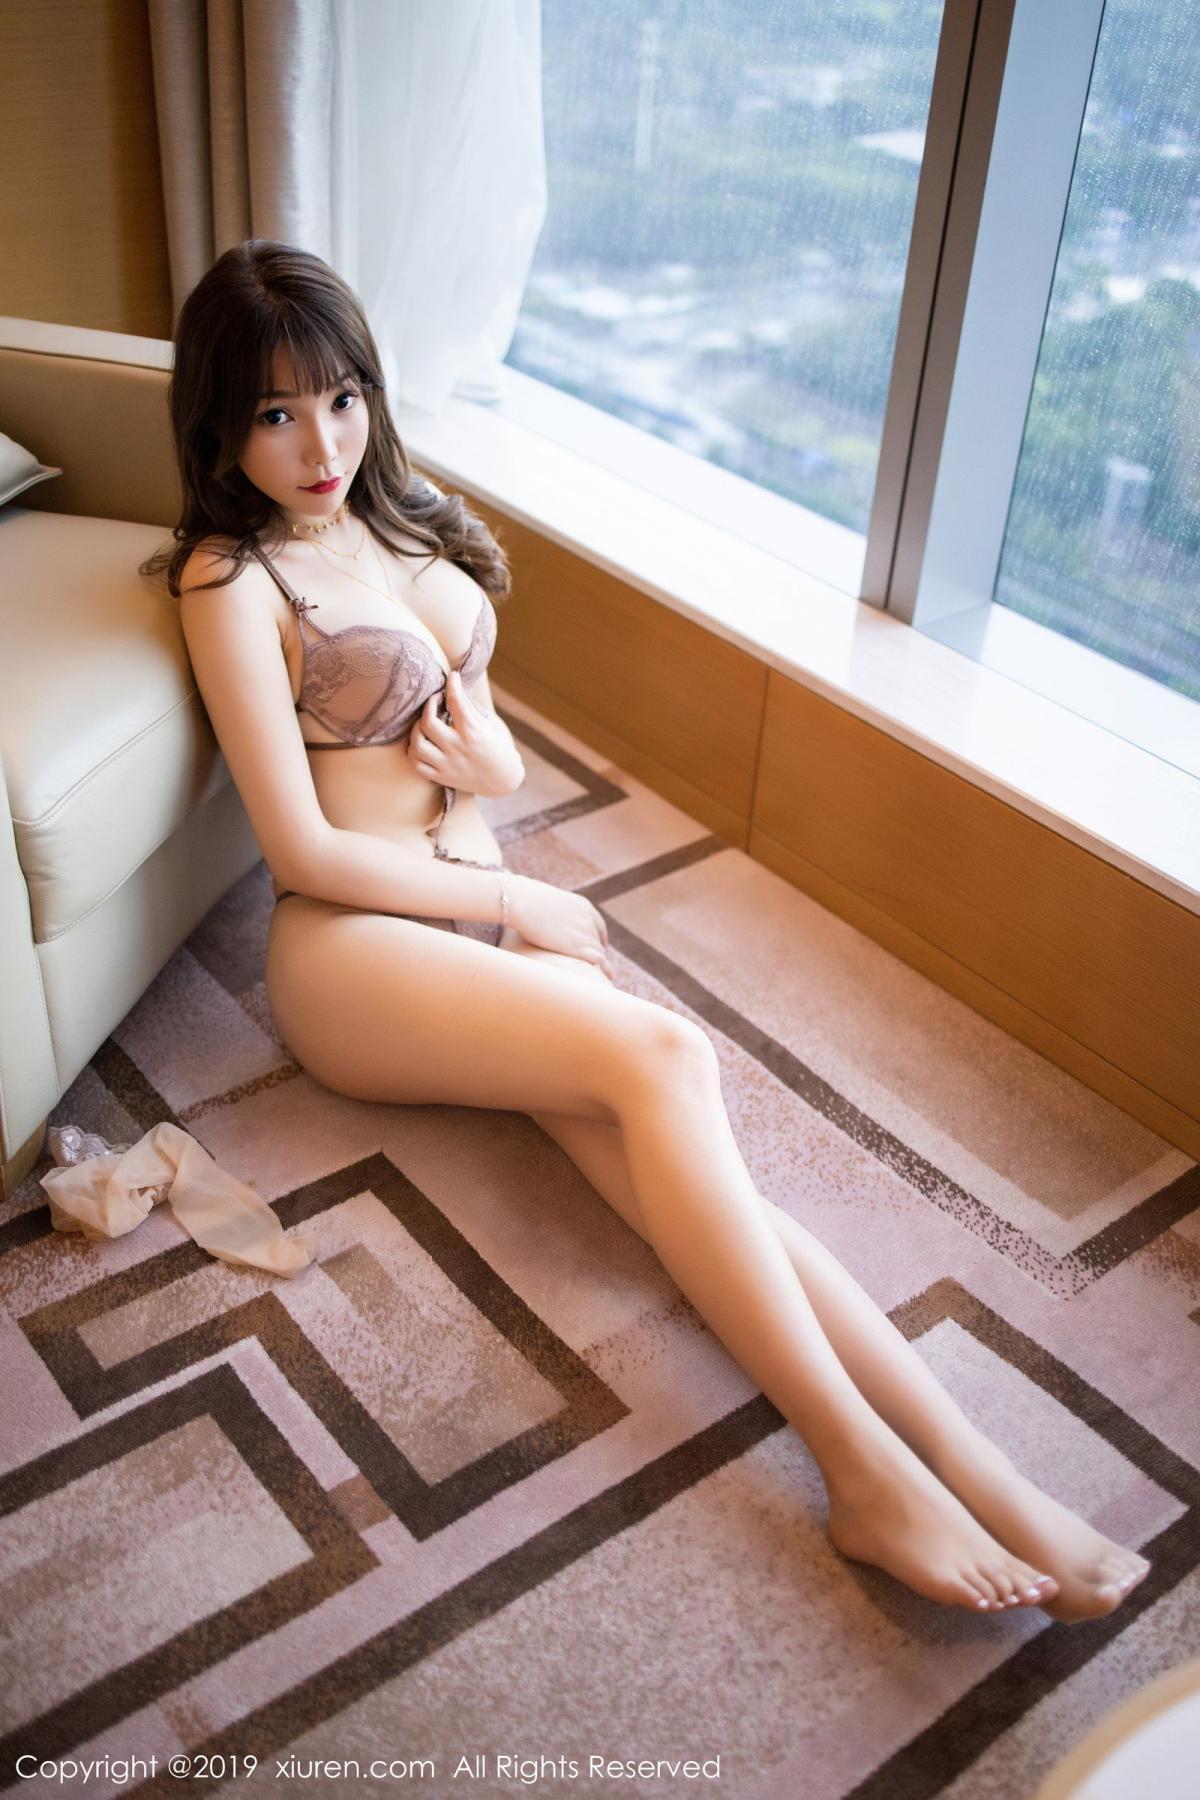 [XiuRen] Vol.1675 Chen Zhi 66P, Chen Zhi, Cheongsam, Tall, Underwear, Xiuren